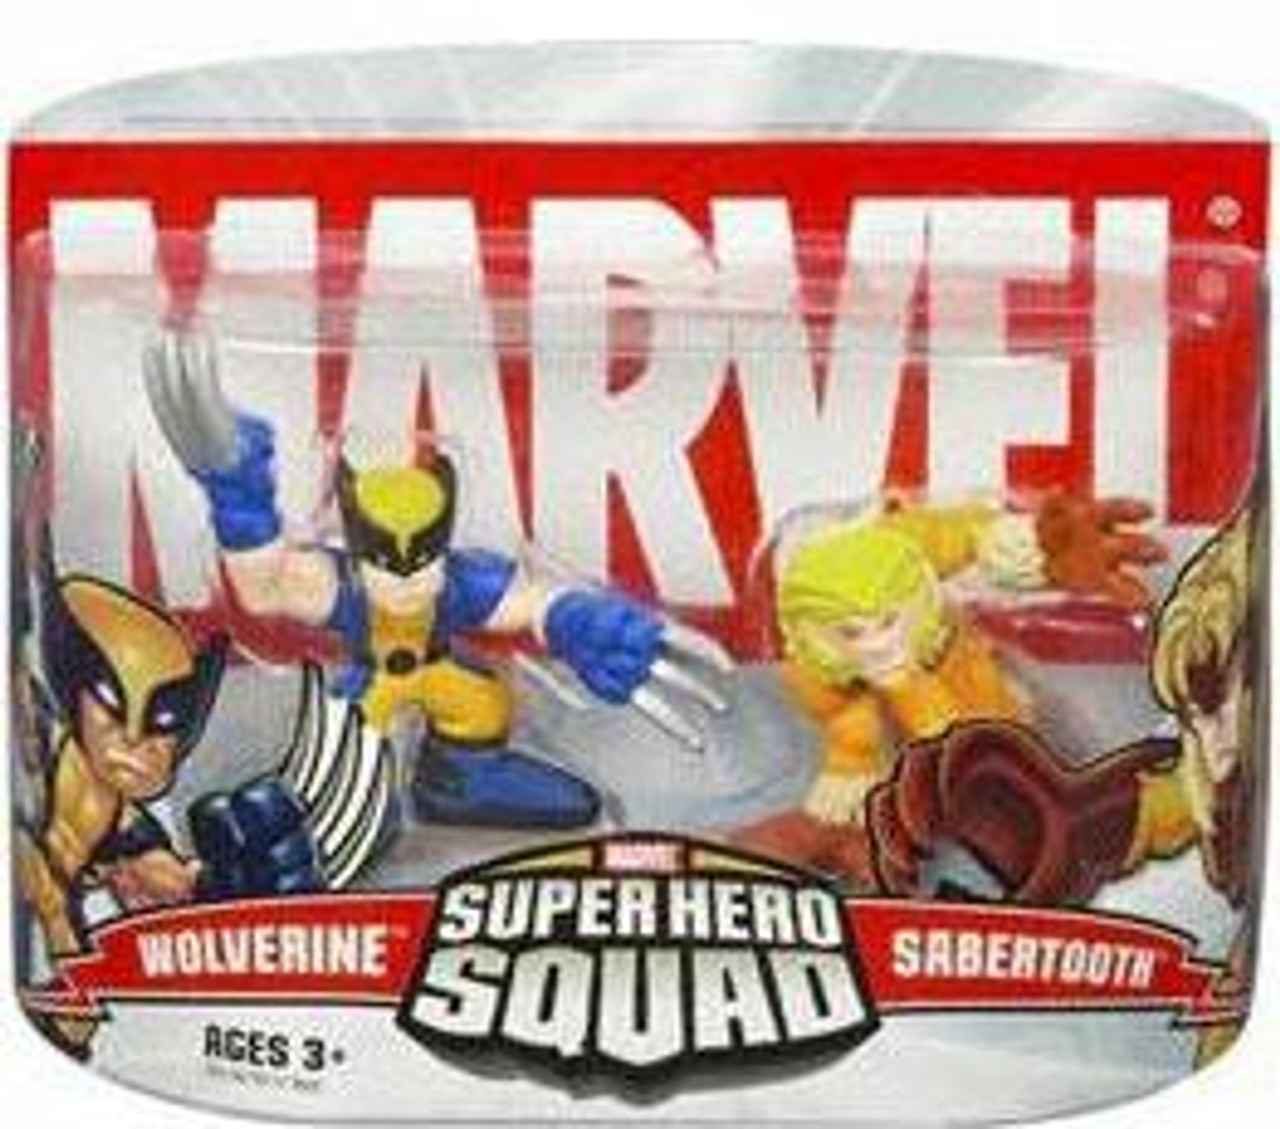 Marvel Super Hero Squad Series 1 Wolverine & Sabretooth Action Figure 2-Pack